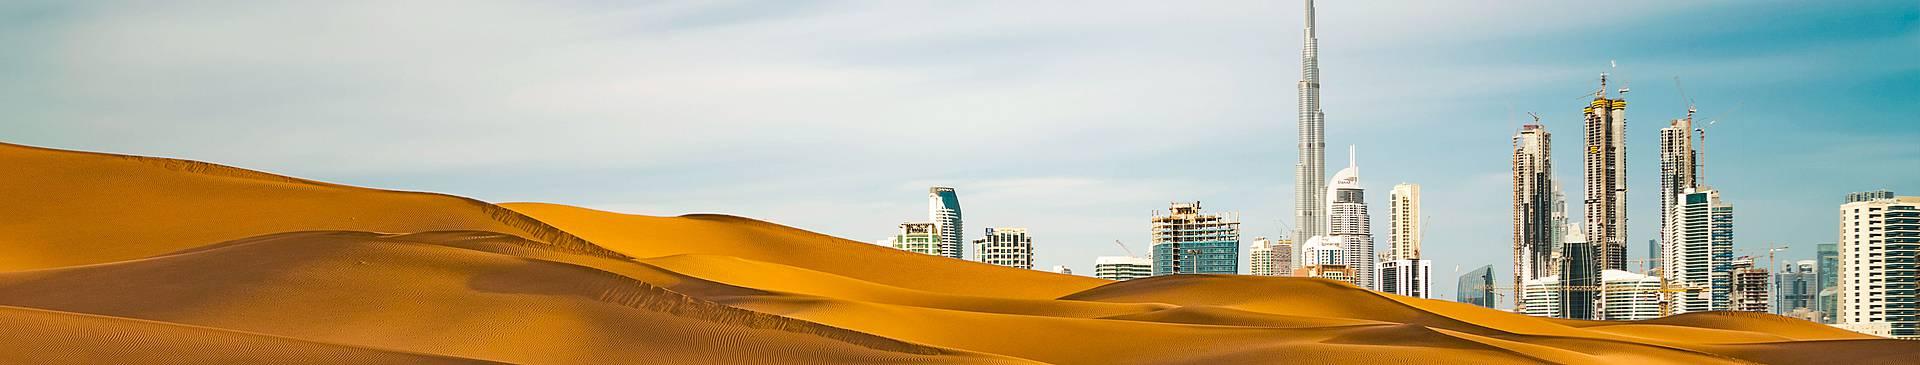 Viaggi nel deserto a Dubai